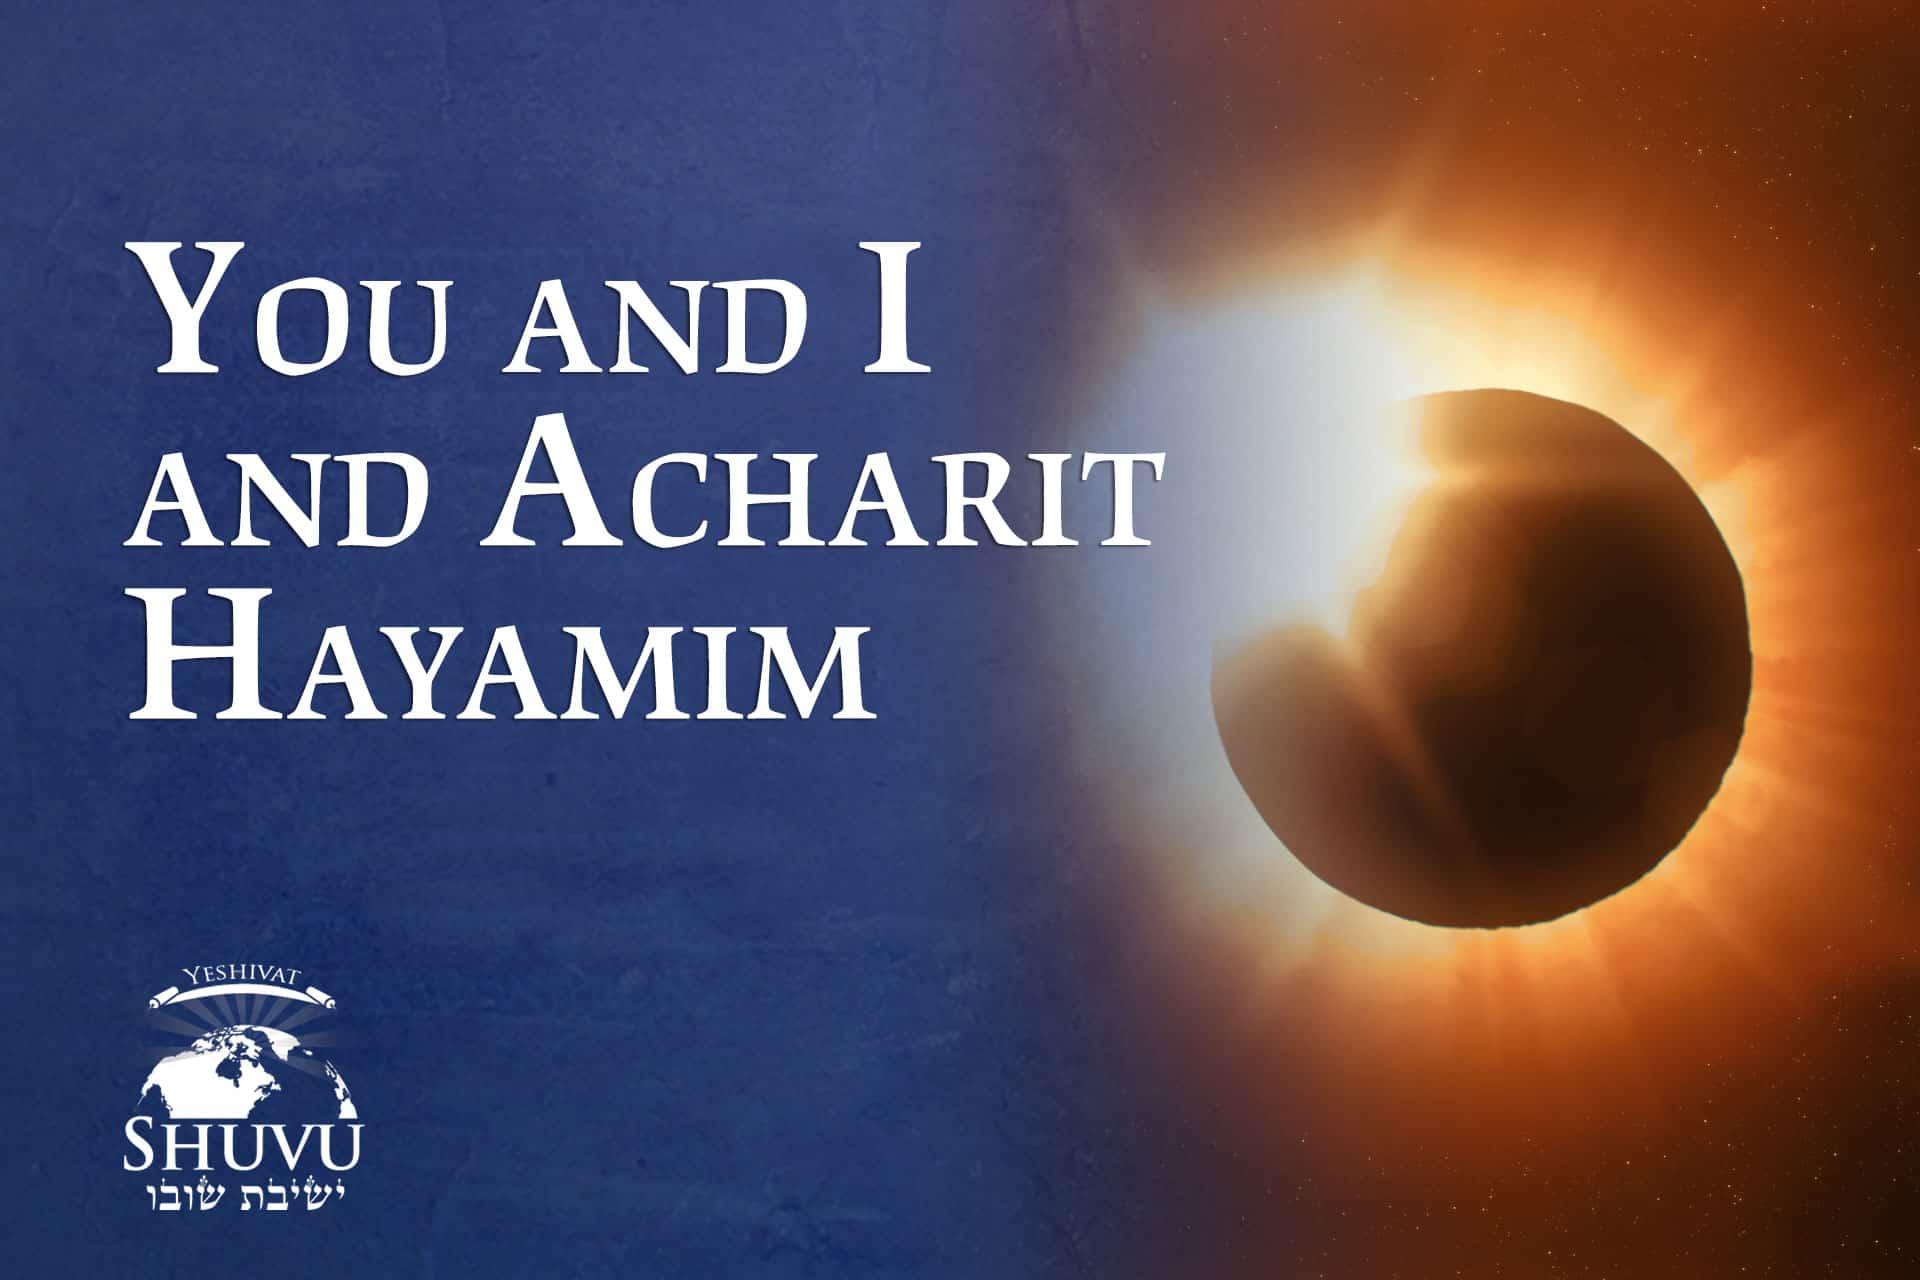 cover_yeshivat_shuvu_acharit_hayamim_ENG_alt